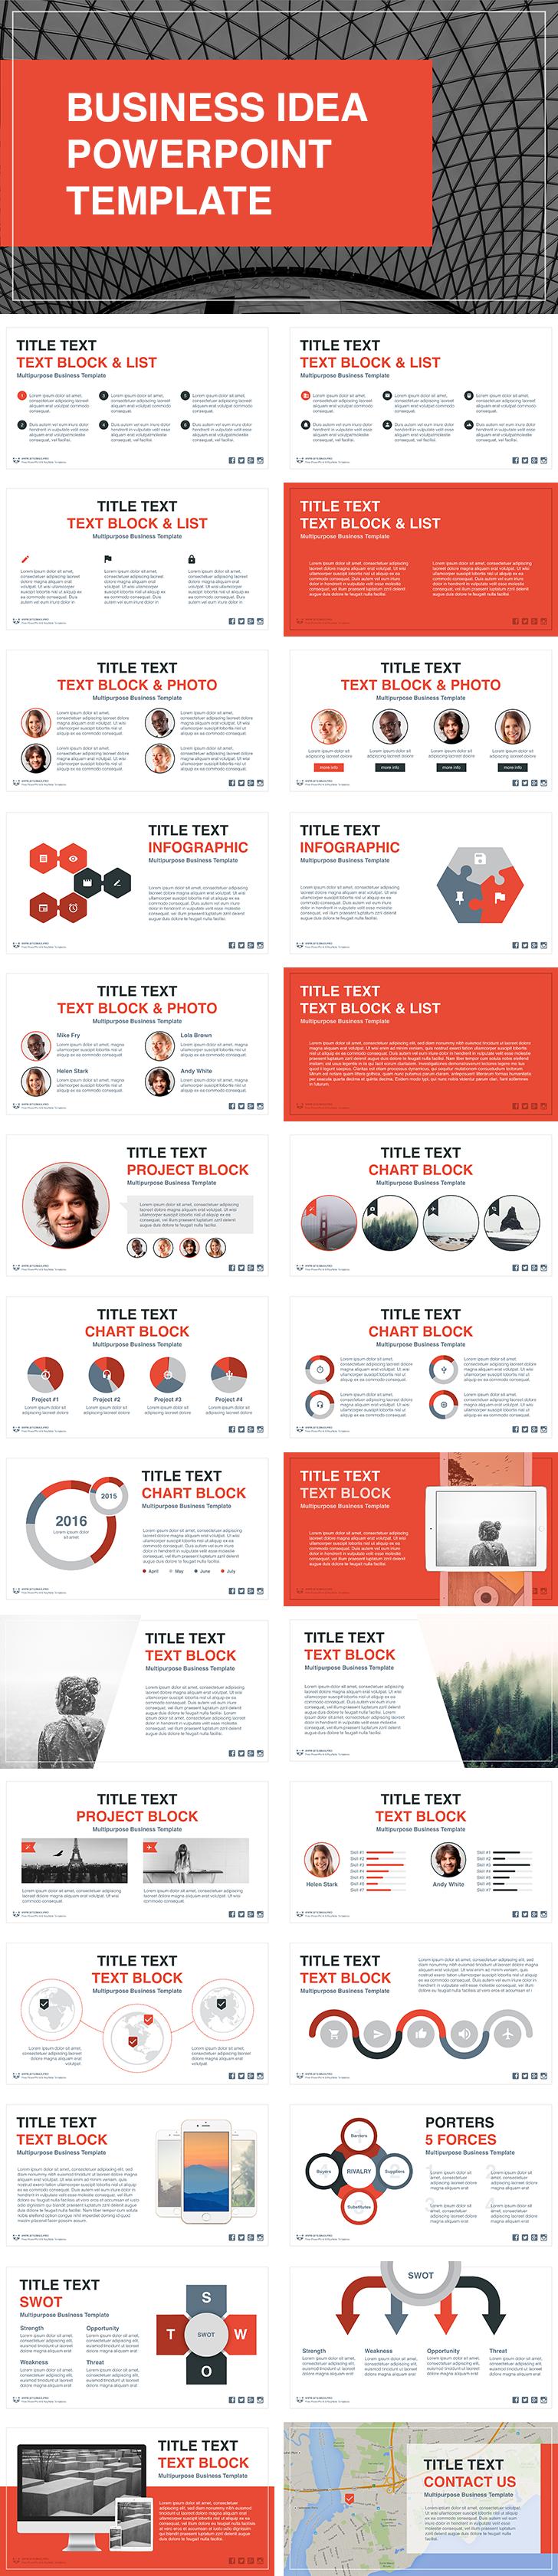 business idea free powerpoint template work pinterest